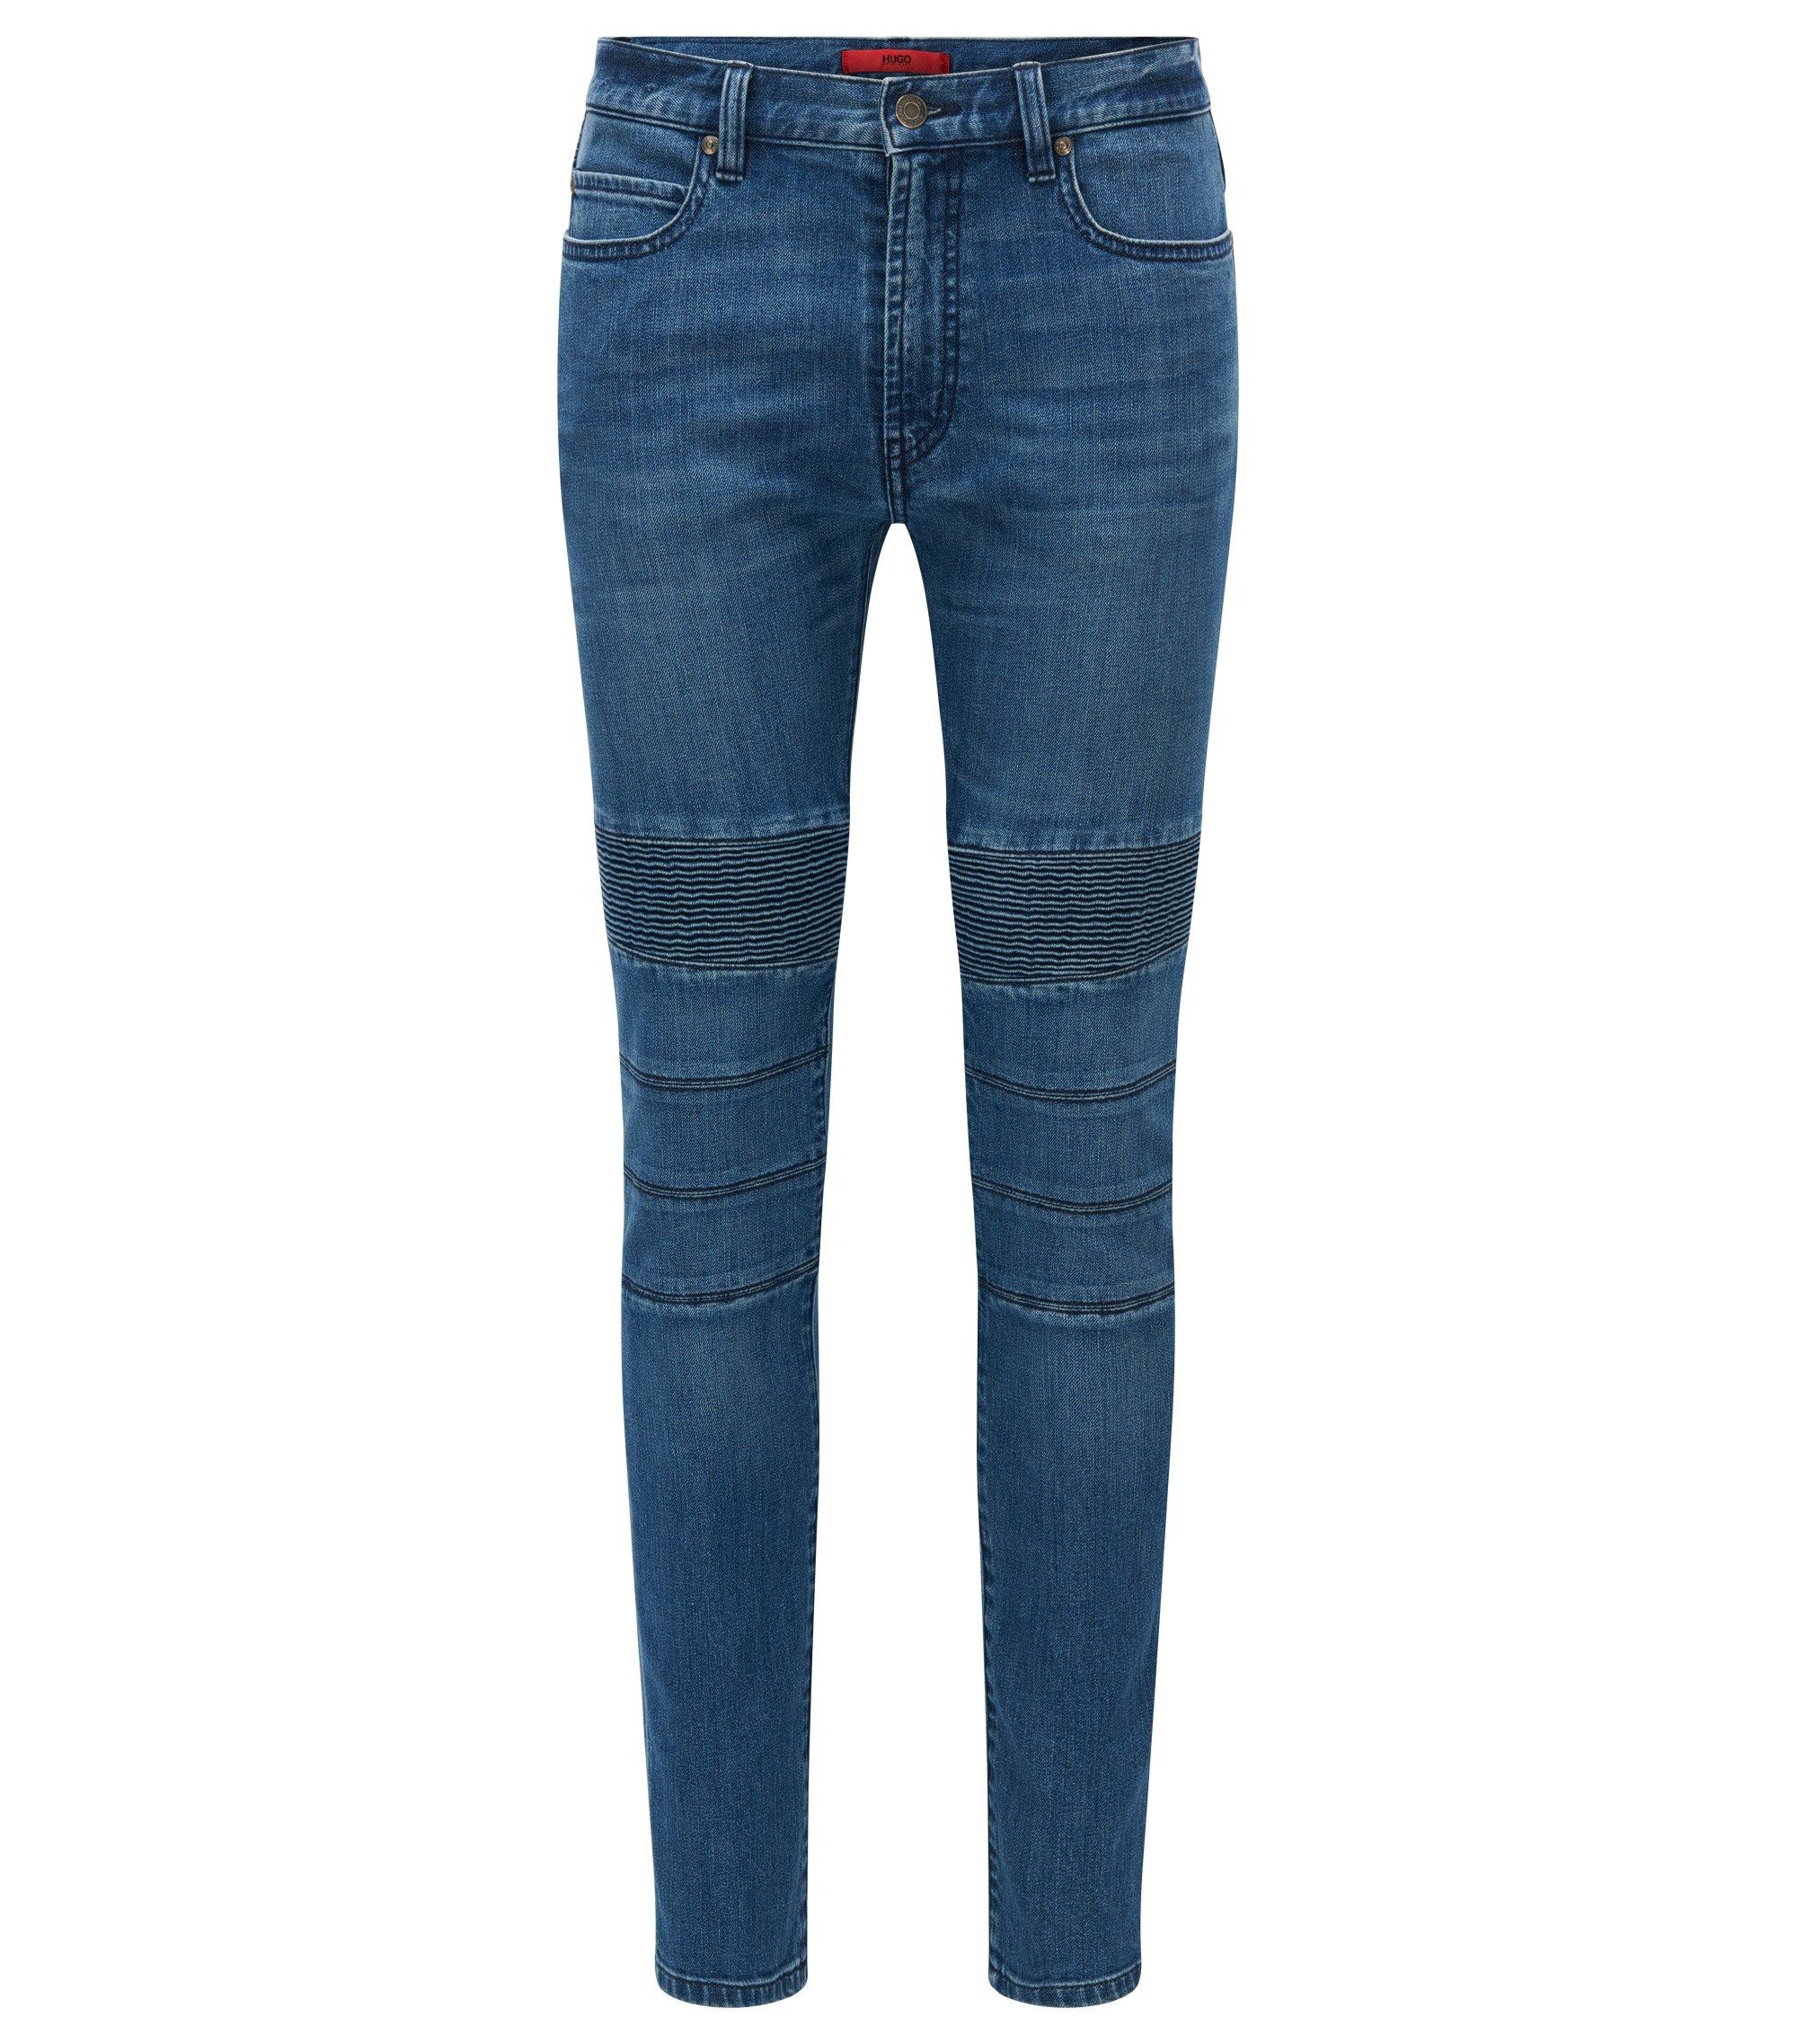 10.75 oz Stretch Cotton Blend Jeans, Skinny Fit | Hugo734, Blue